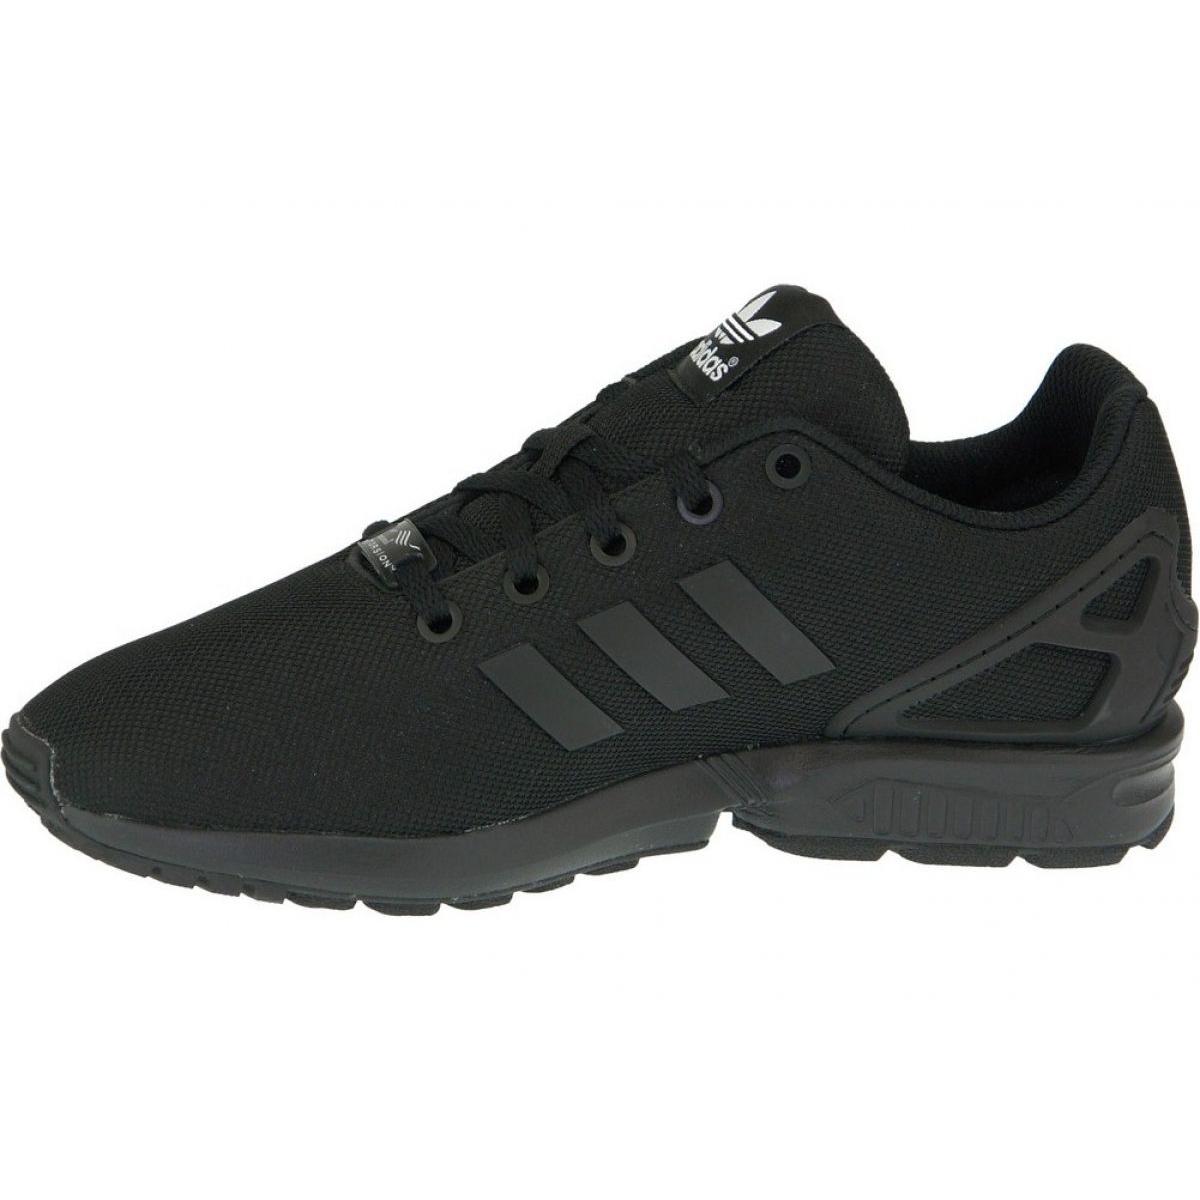 timeless design b4a89 4777f Black Adidas Zx Flux W S82695 shoes